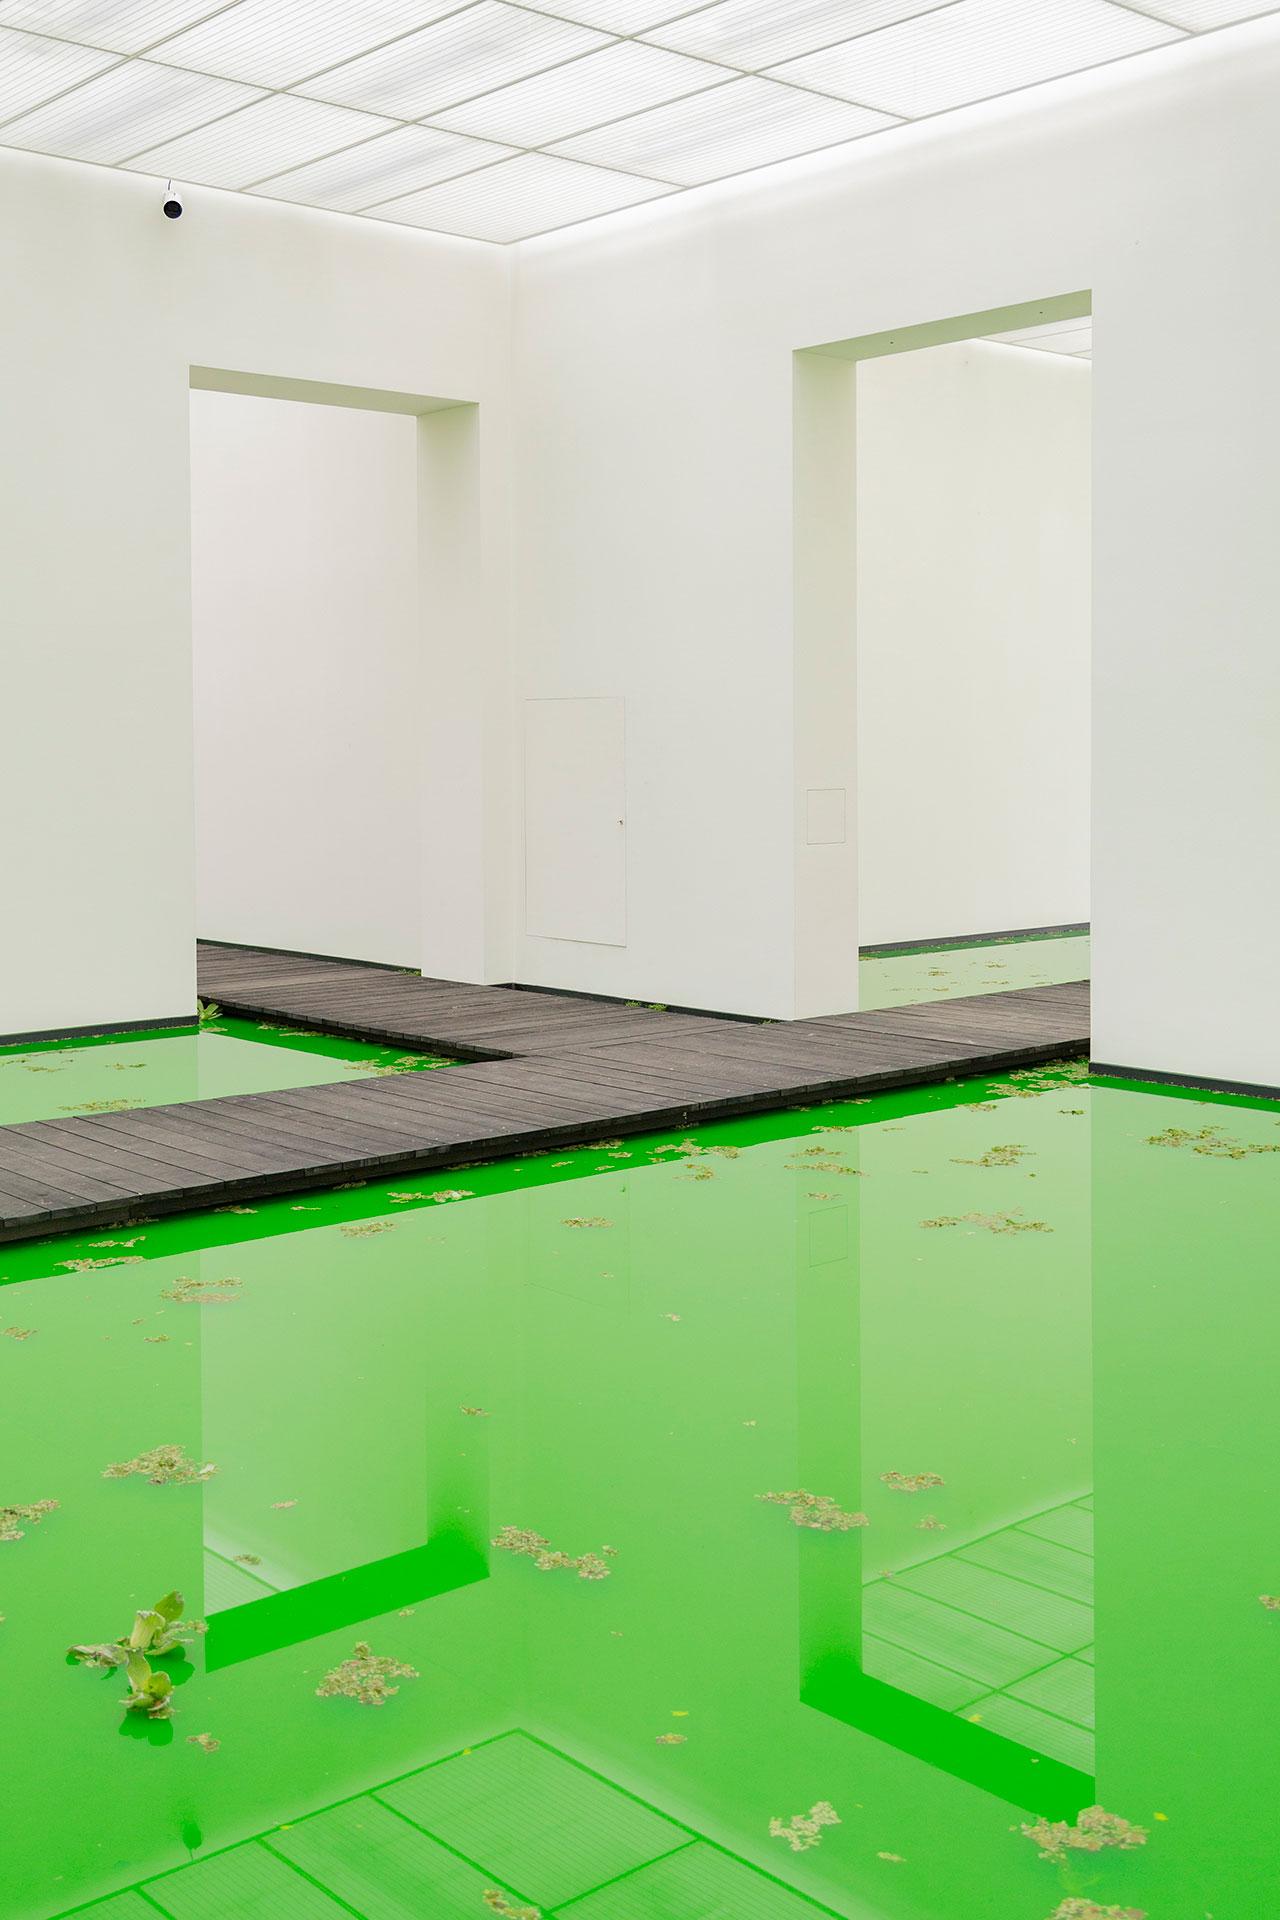 Olafur Eliasson,LIFE, 2021.Installation view: Fondation Beyeler, Riehen/Basel, 2021.Courtesy of the artist; neugerriemschneider, Berlin; Tanya Bonakdar Gallery, New York / Los Angeles © 2021 Olafur Eliasson. Photo:Pati Grabowicz